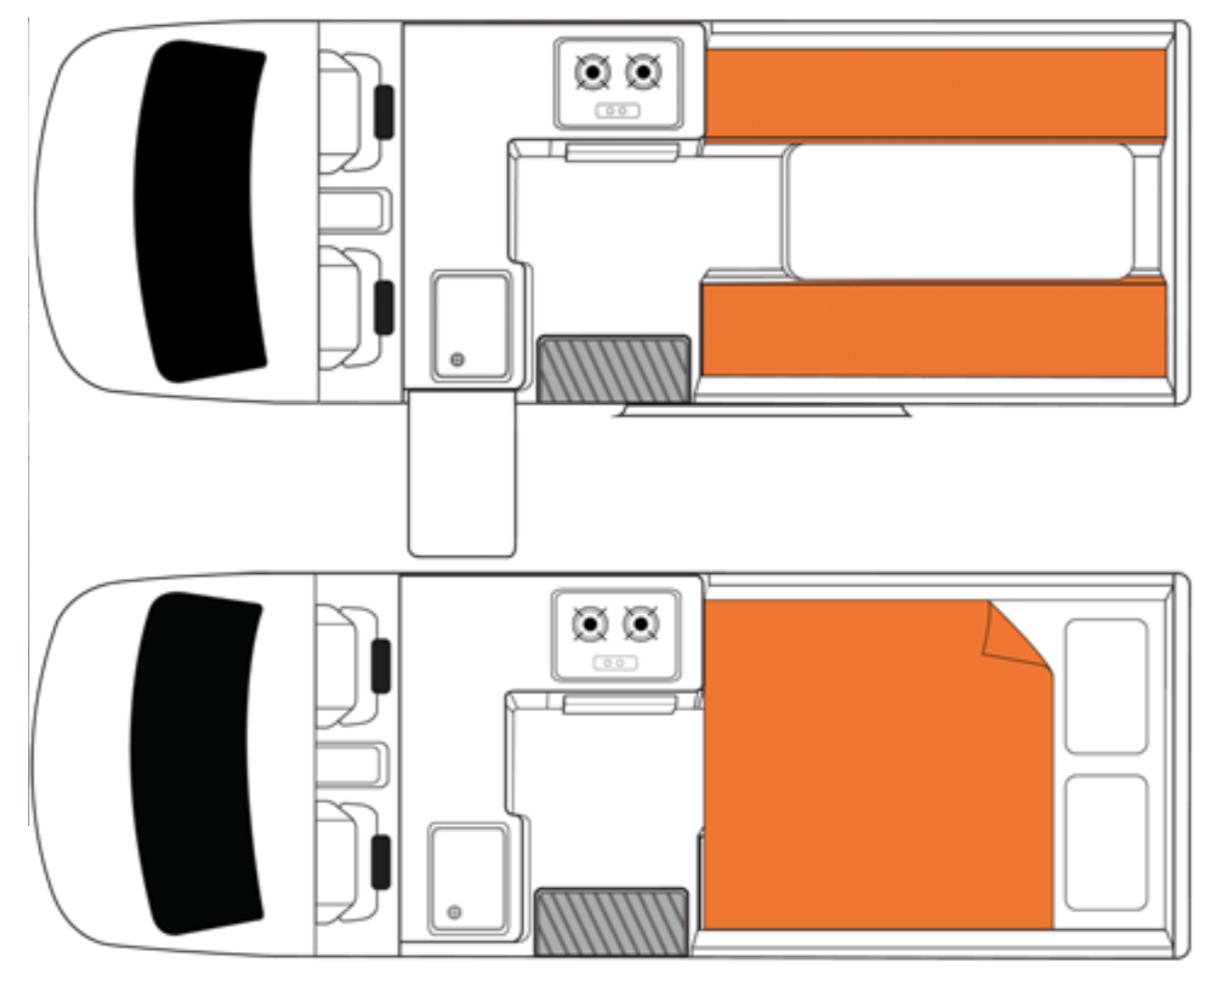 Britz-Hi-Top Inside Prototype Design - Camper Hire Sydney - Campervan Rental Shop